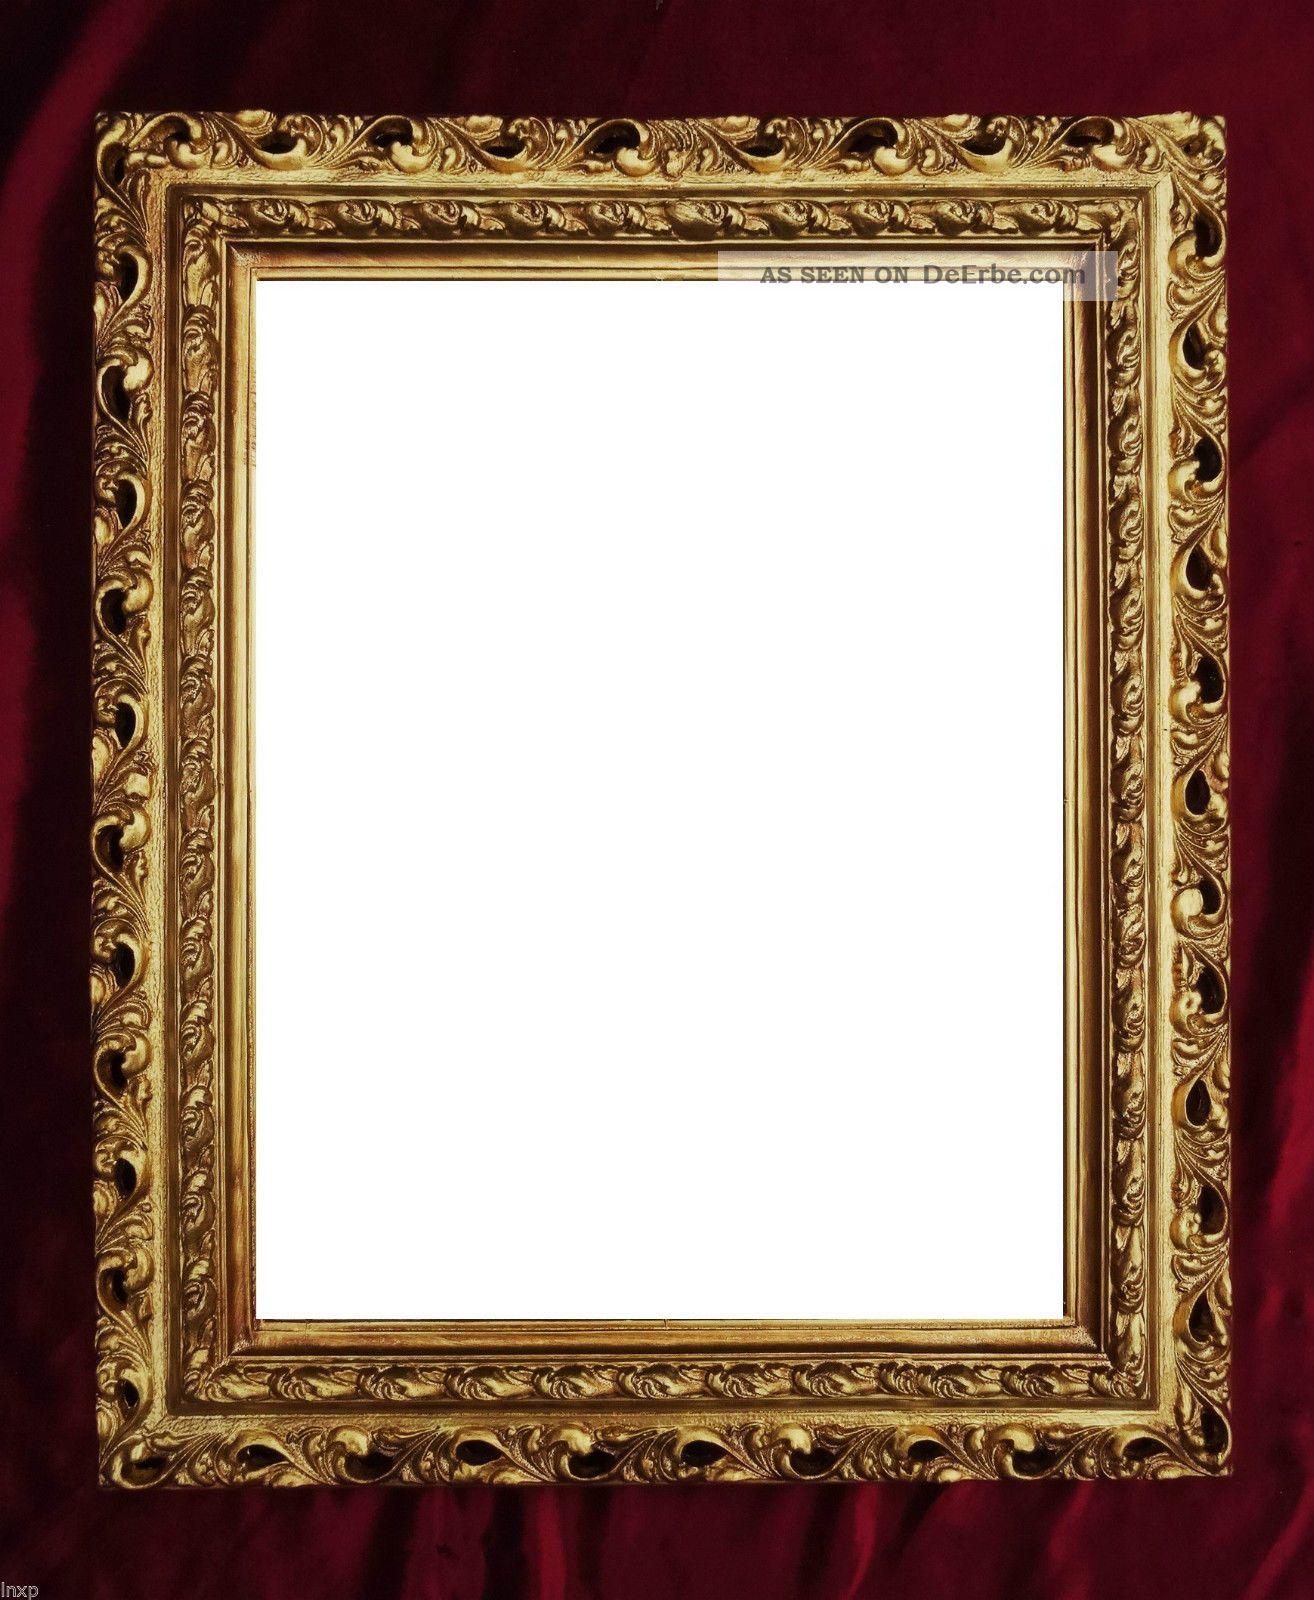 wandspiegel 43x36 spiegel barock rechteckig gold bilderrahmen arabesco 3. Black Bedroom Furniture Sets. Home Design Ideas